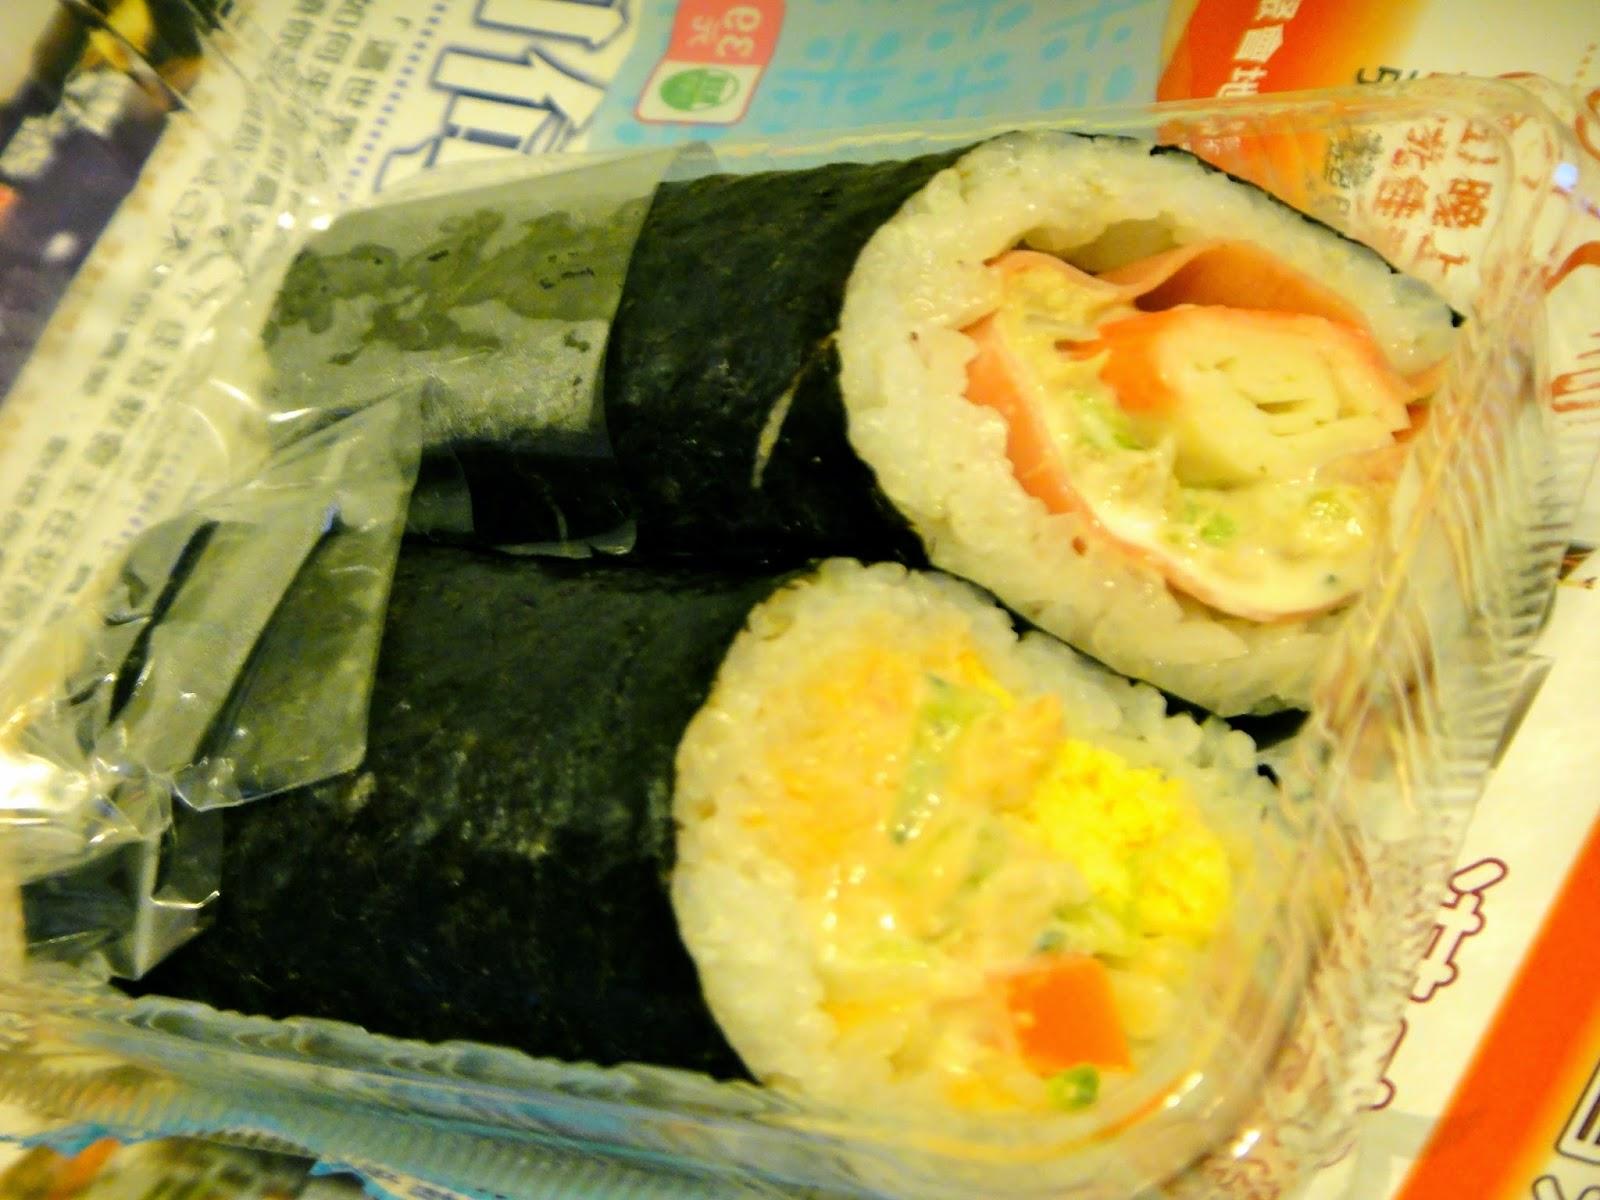 7-11 Taiwan Sushi Roll Lunch Deal